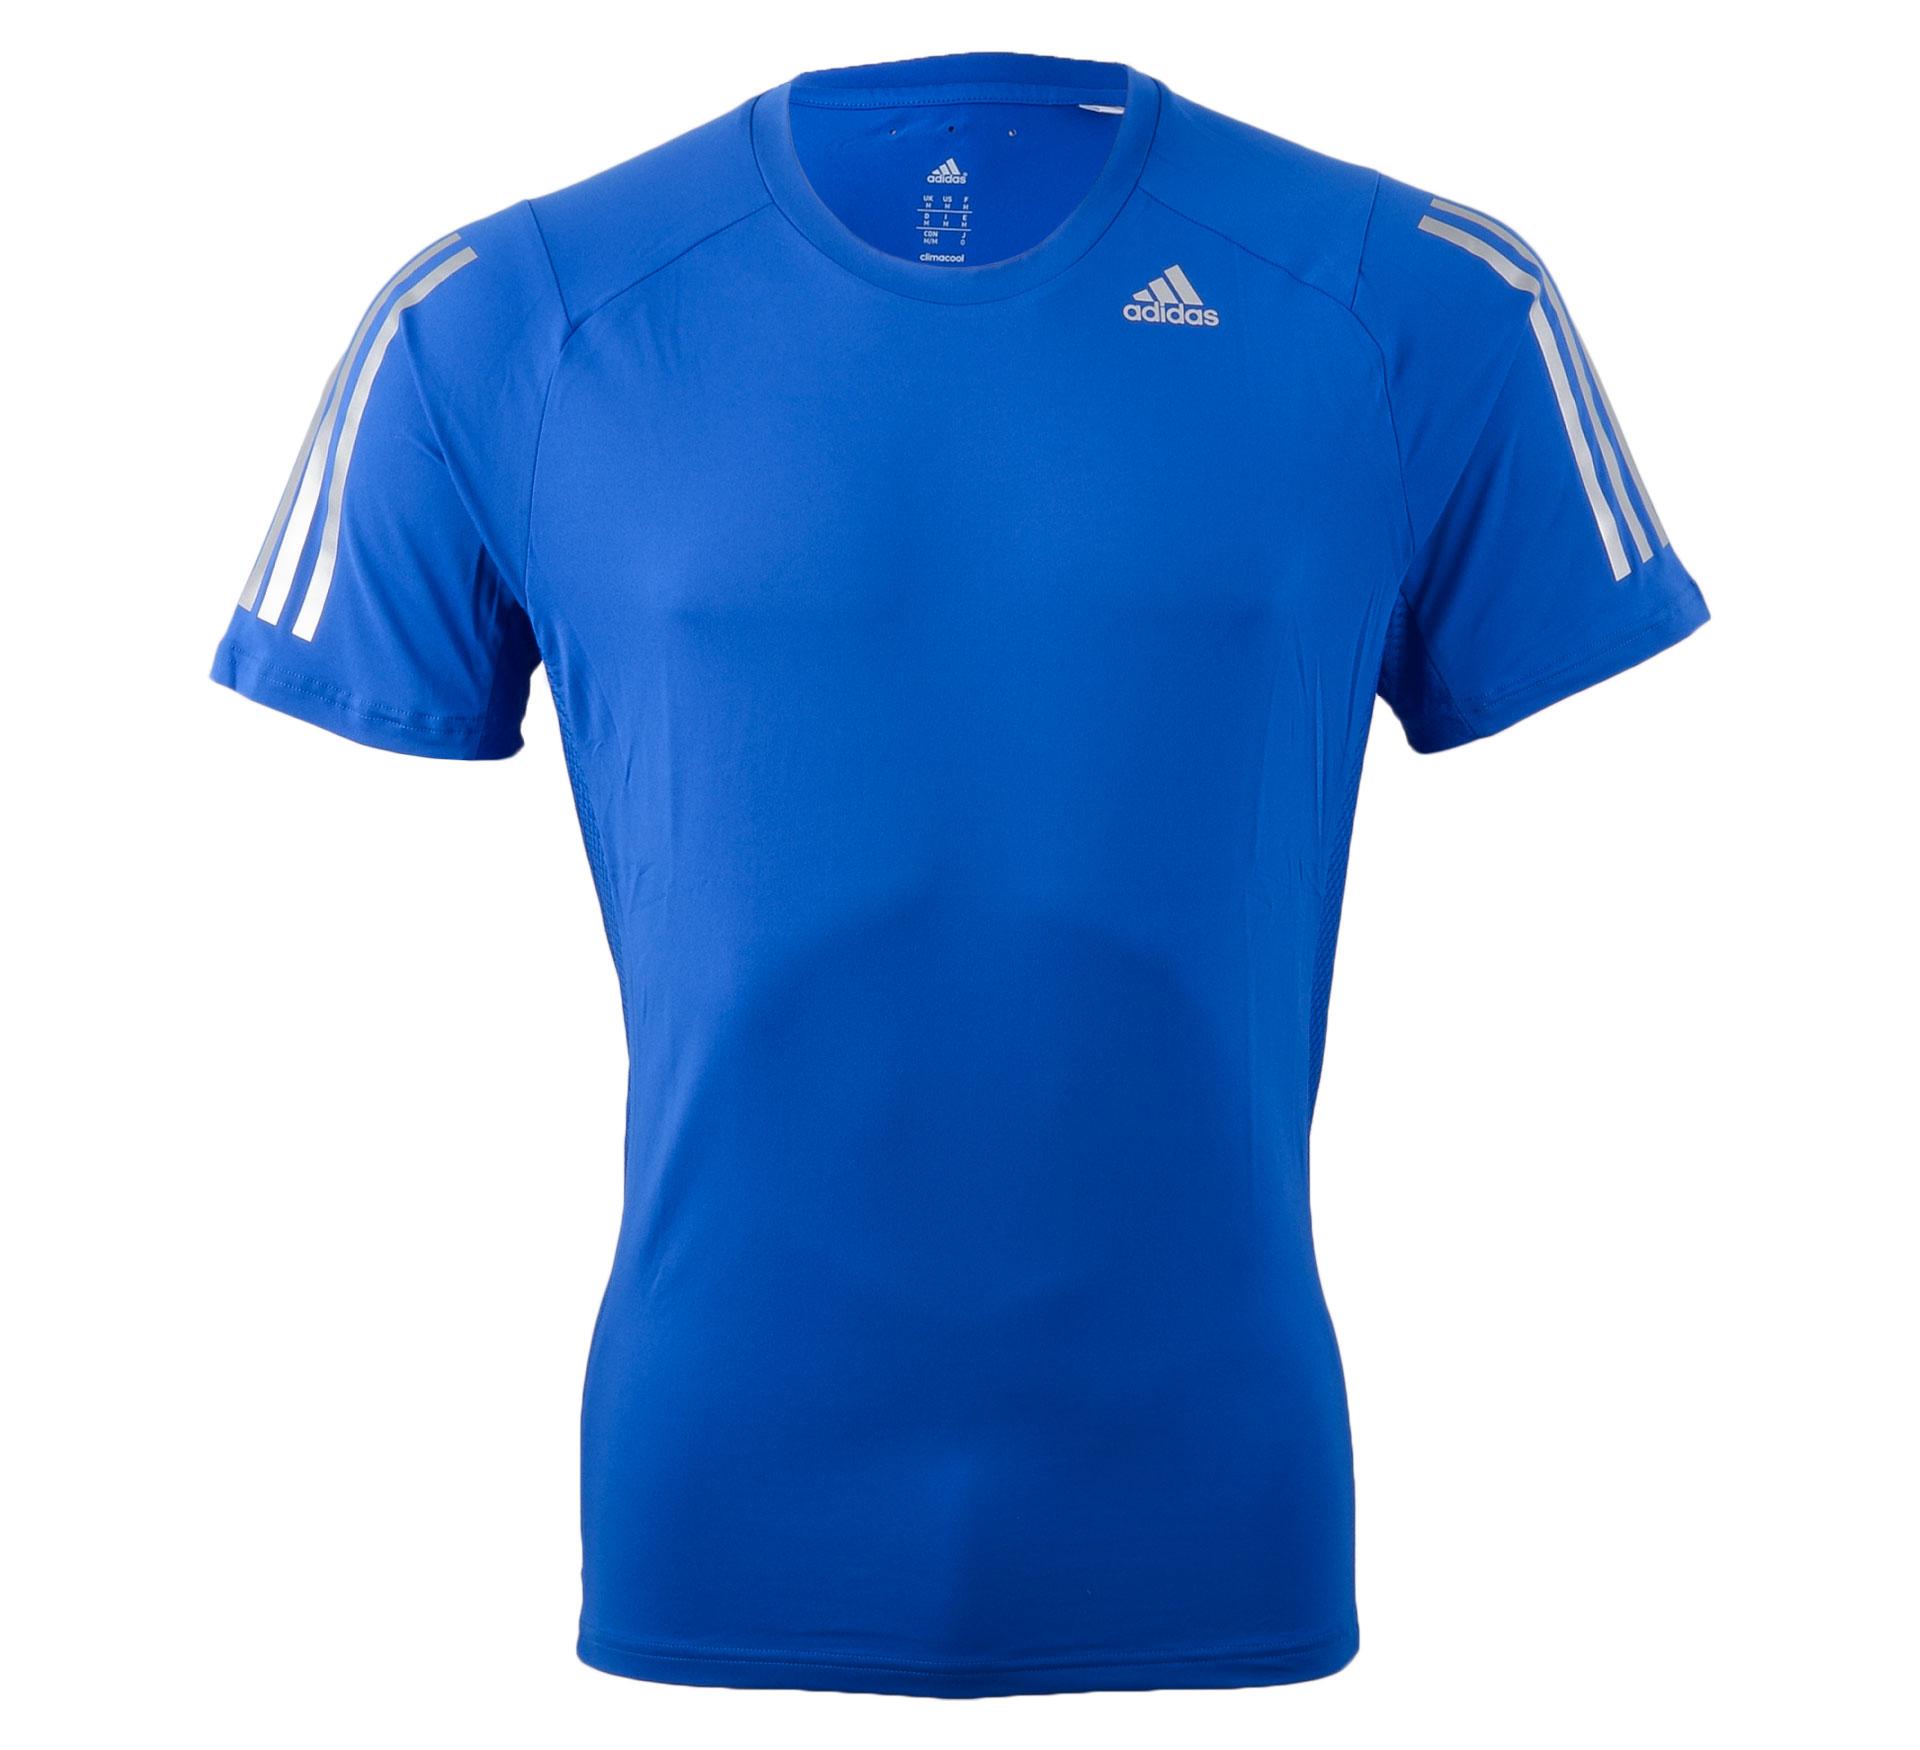 Adidas  Cool365 Tee blauw - zilver